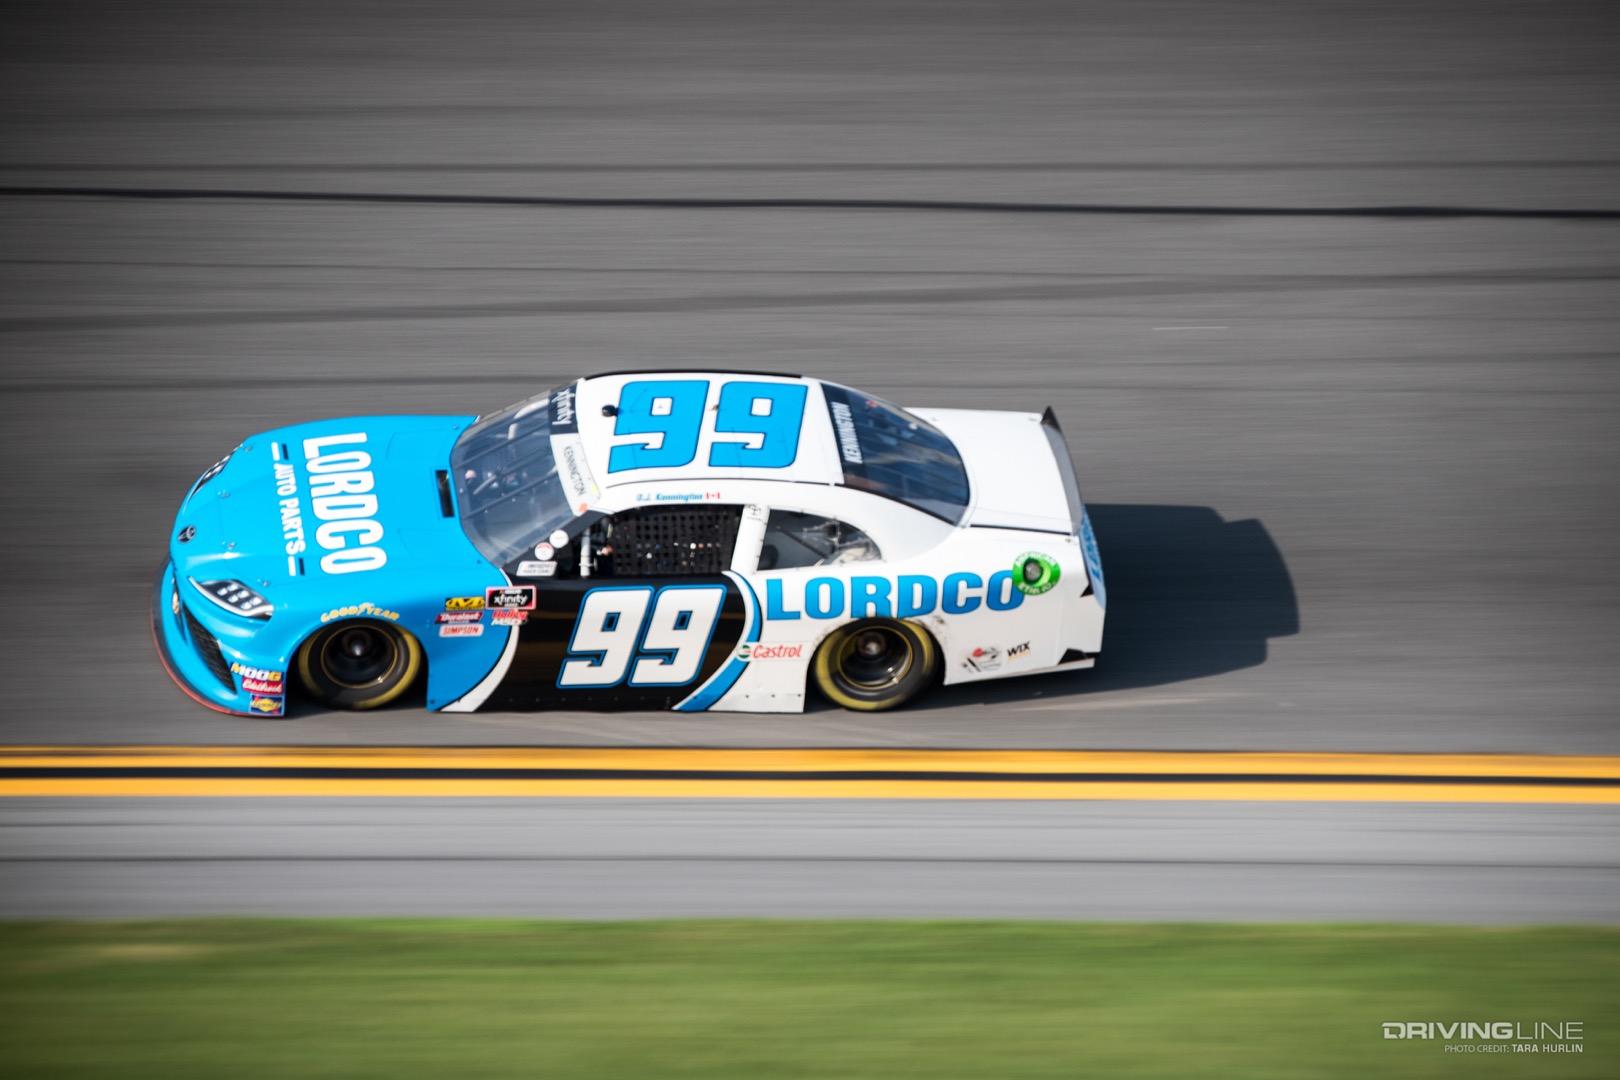 Toyota Tundra Diesel >> NASCAR Supra Debuts at Daytona | DrivingLine